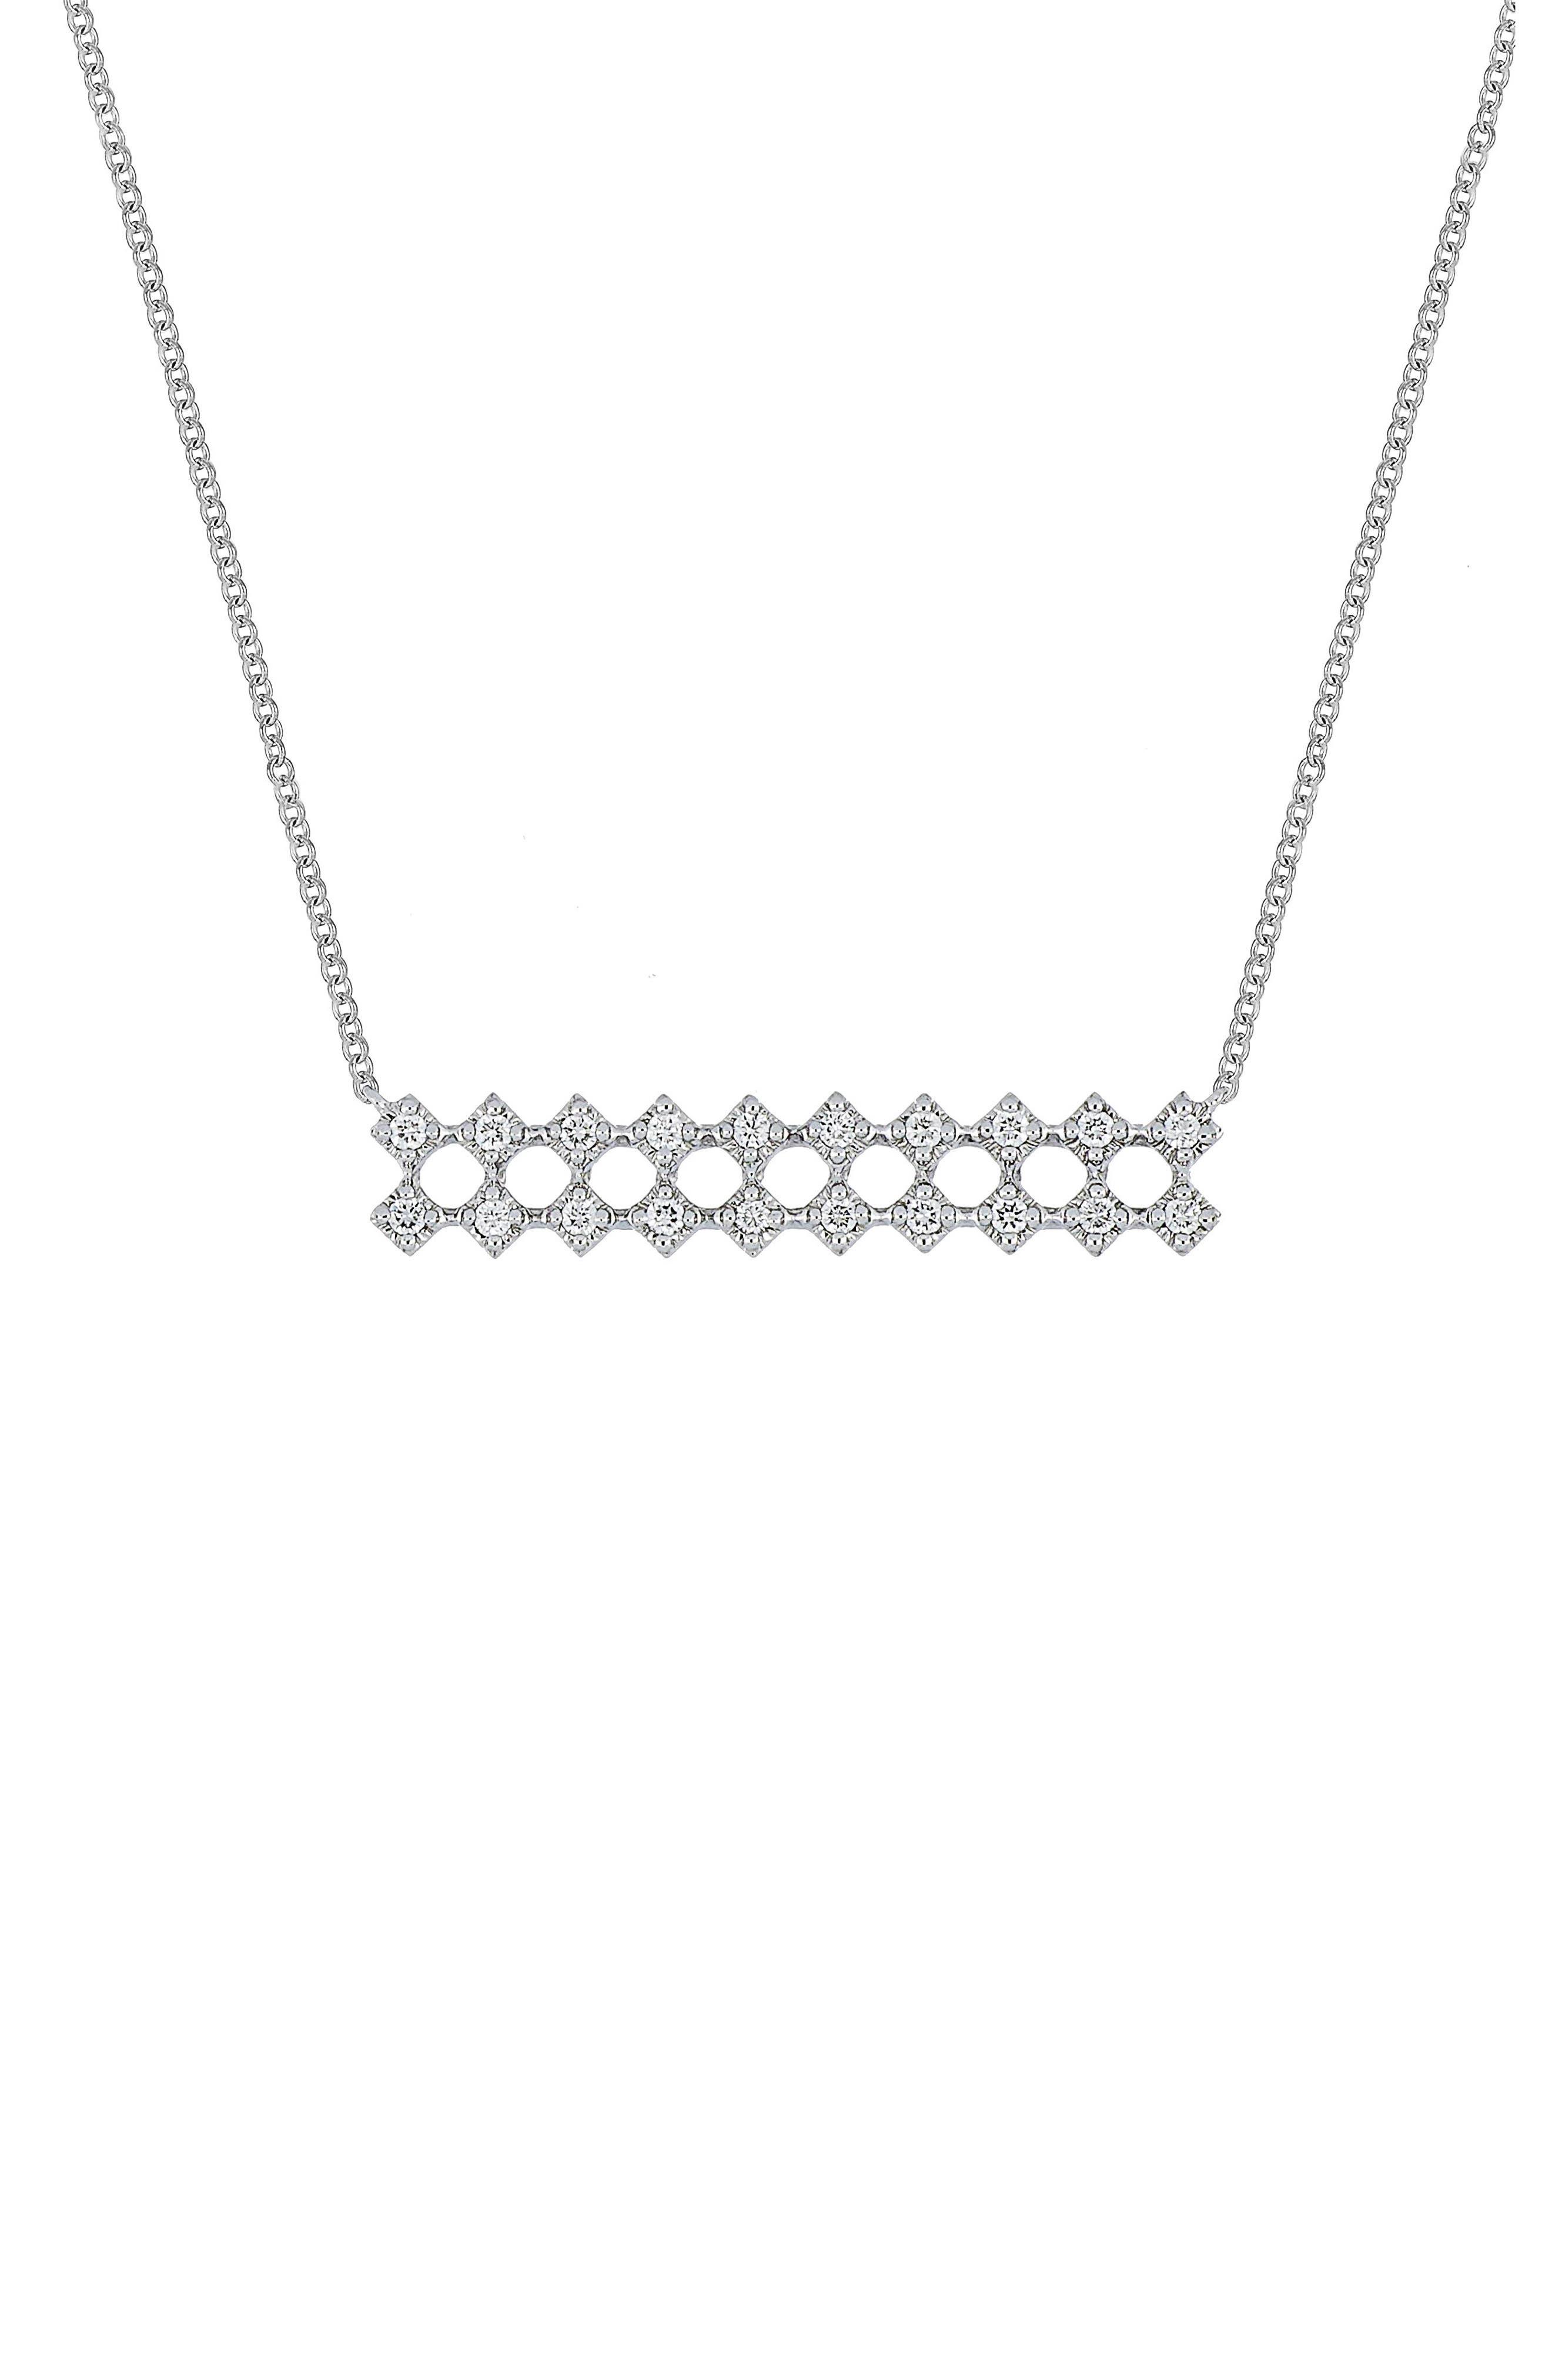 Mila Large Bar Pendant Necklace,                             Main thumbnail 1, color,                             WHITE GOLD